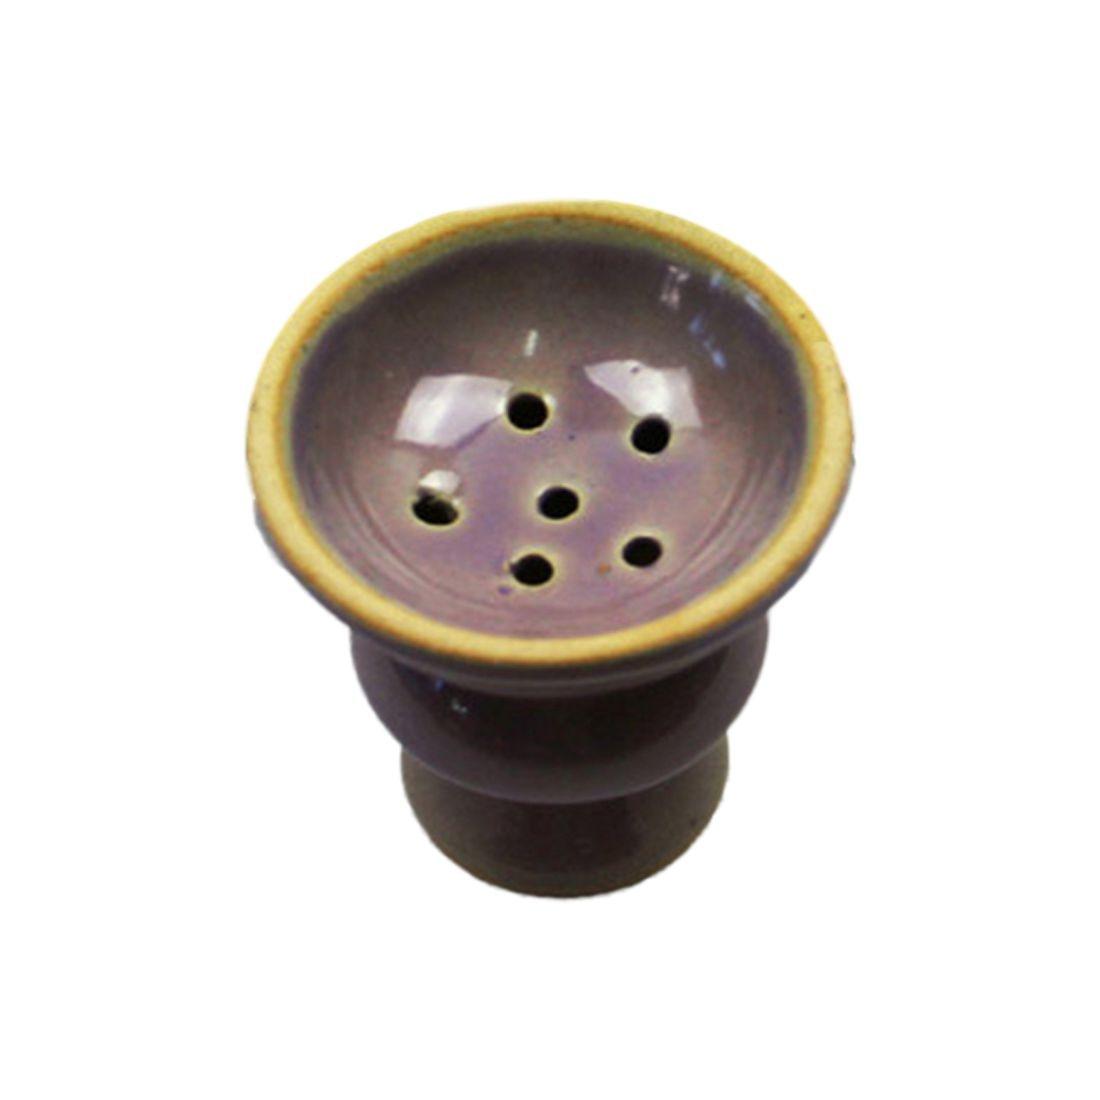 Ceramic Hookah Head Funnel Bowl for Shisha Nargila Phunnel Pipe Hooka Sheesha